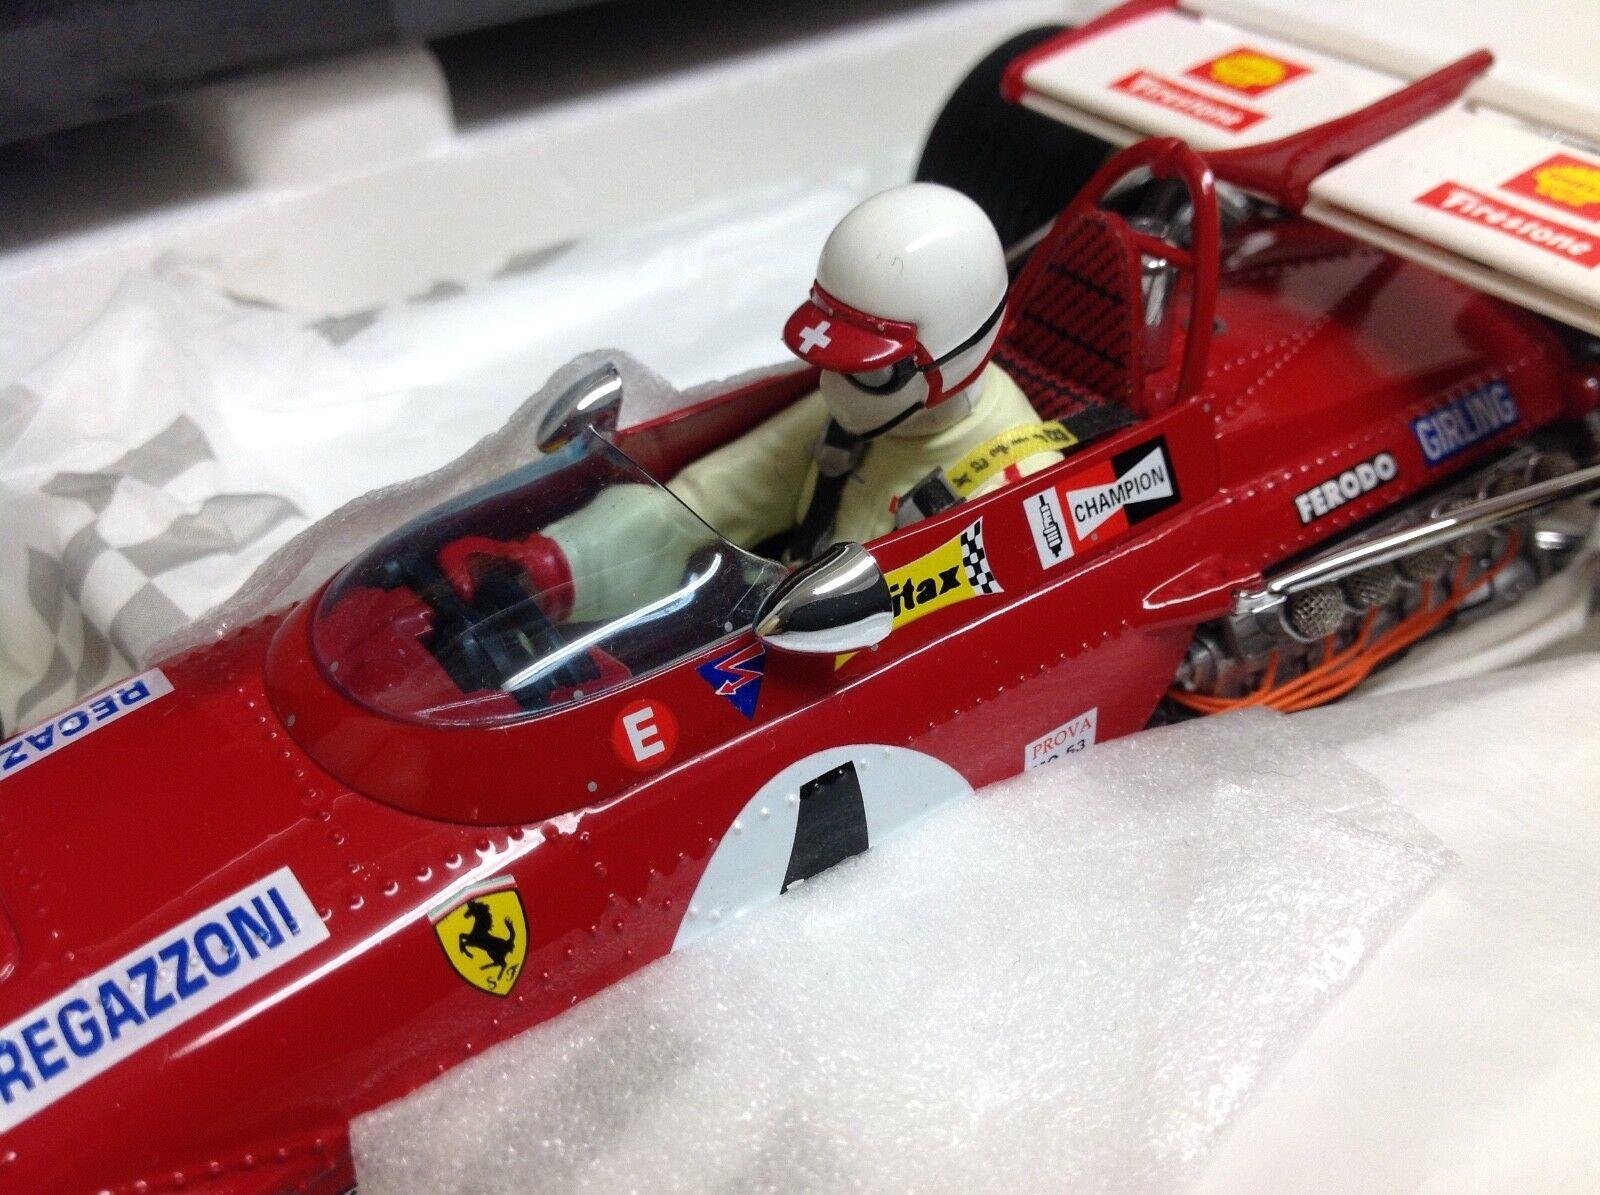 Exoto Ferrari 312 B Clay Regazzoni WINNER  4 1970 GP Inghilterra 1 18 NUOVO 97062